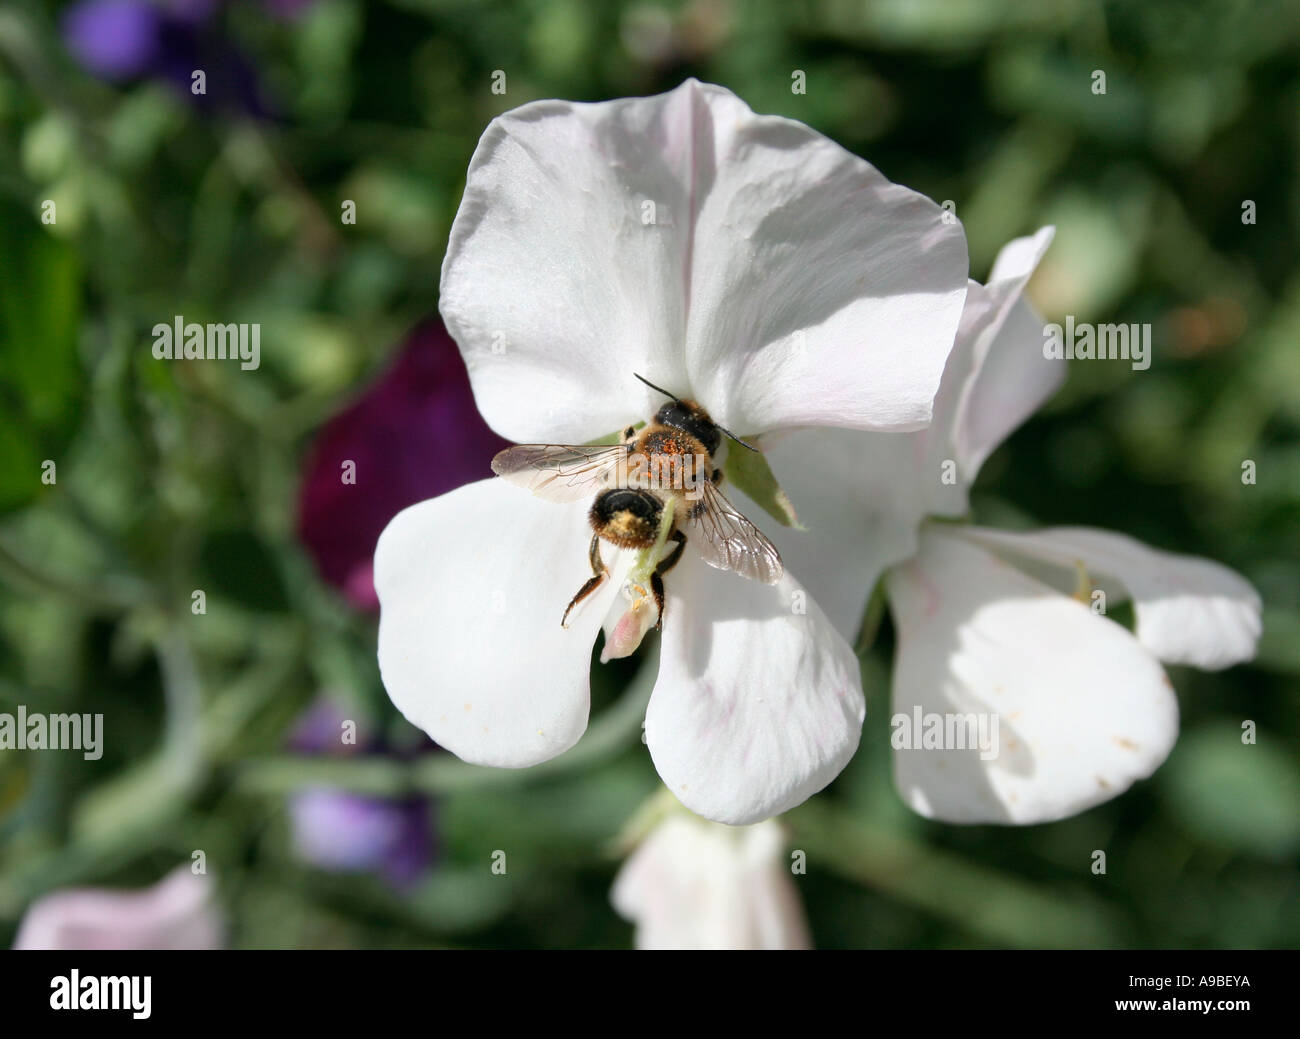 Wonderful white sweet pea flower contemporary wedding and flowers excellent white sweet pea flower ideas wedding and flowers mightylinksfo Gallery